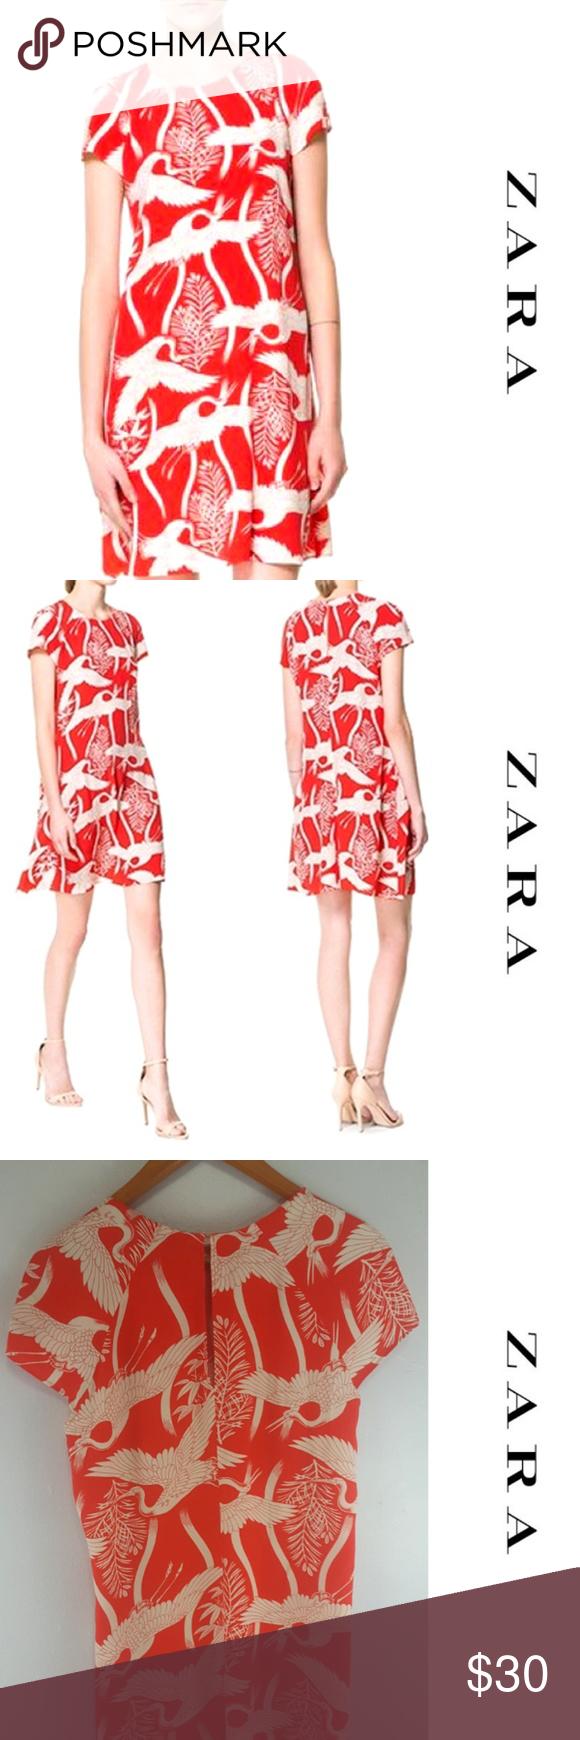 fb80fddd Zara ~ Red Cranes Shift Dress Zara short-sleeve swing dress in a ...